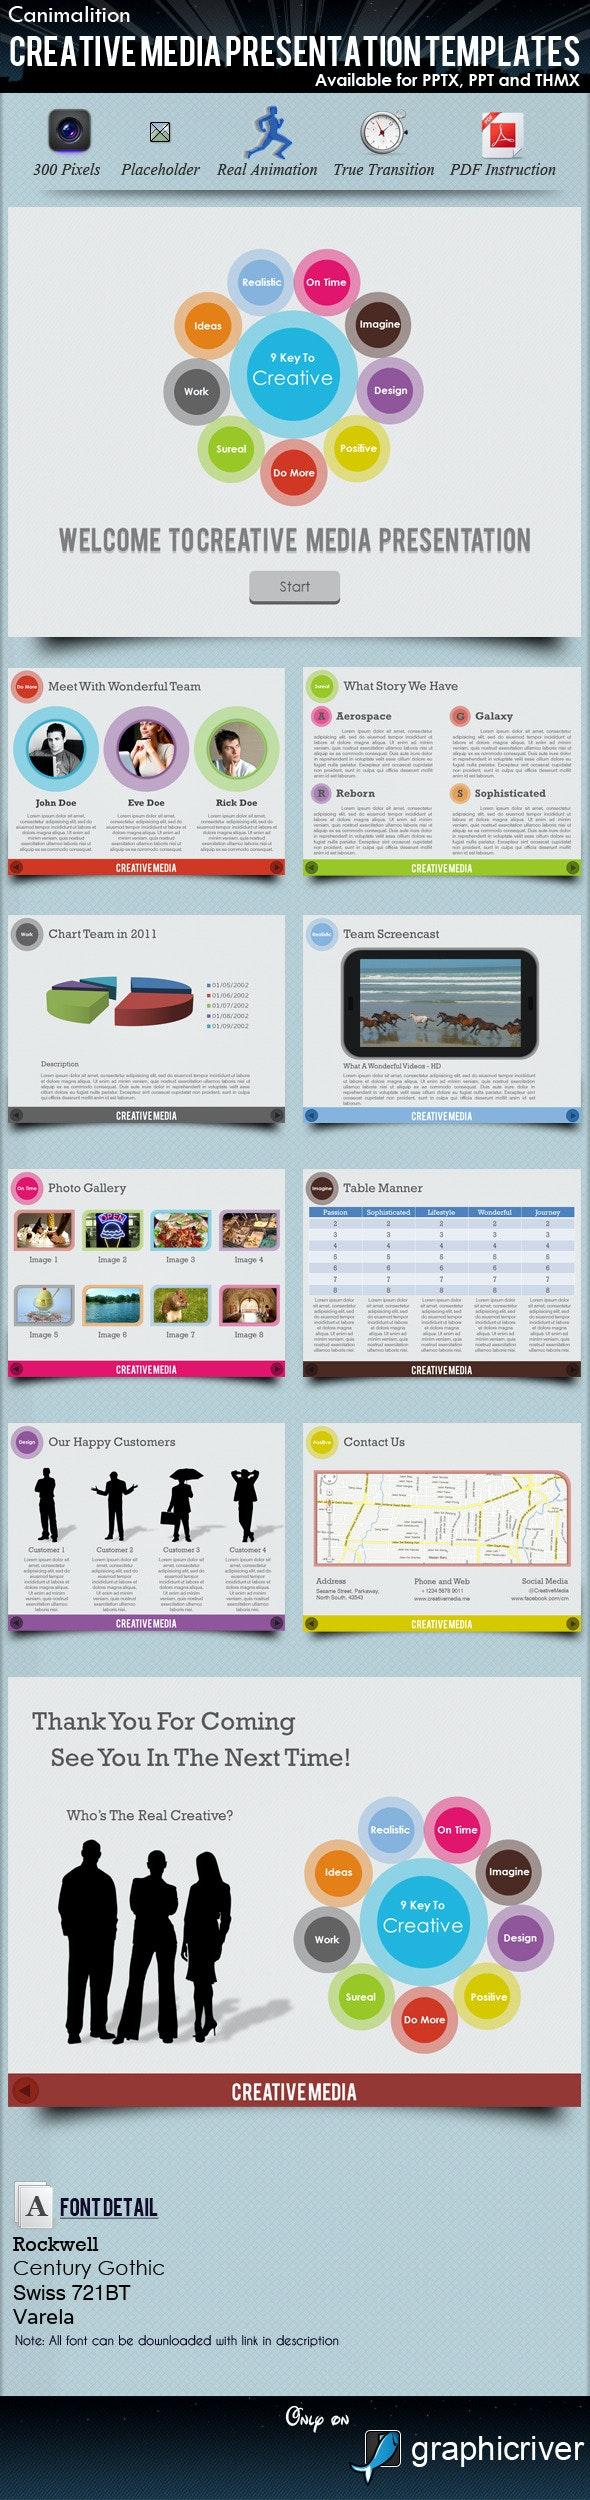 Creative Media Presentation Templates - Creative PowerPoint Templates